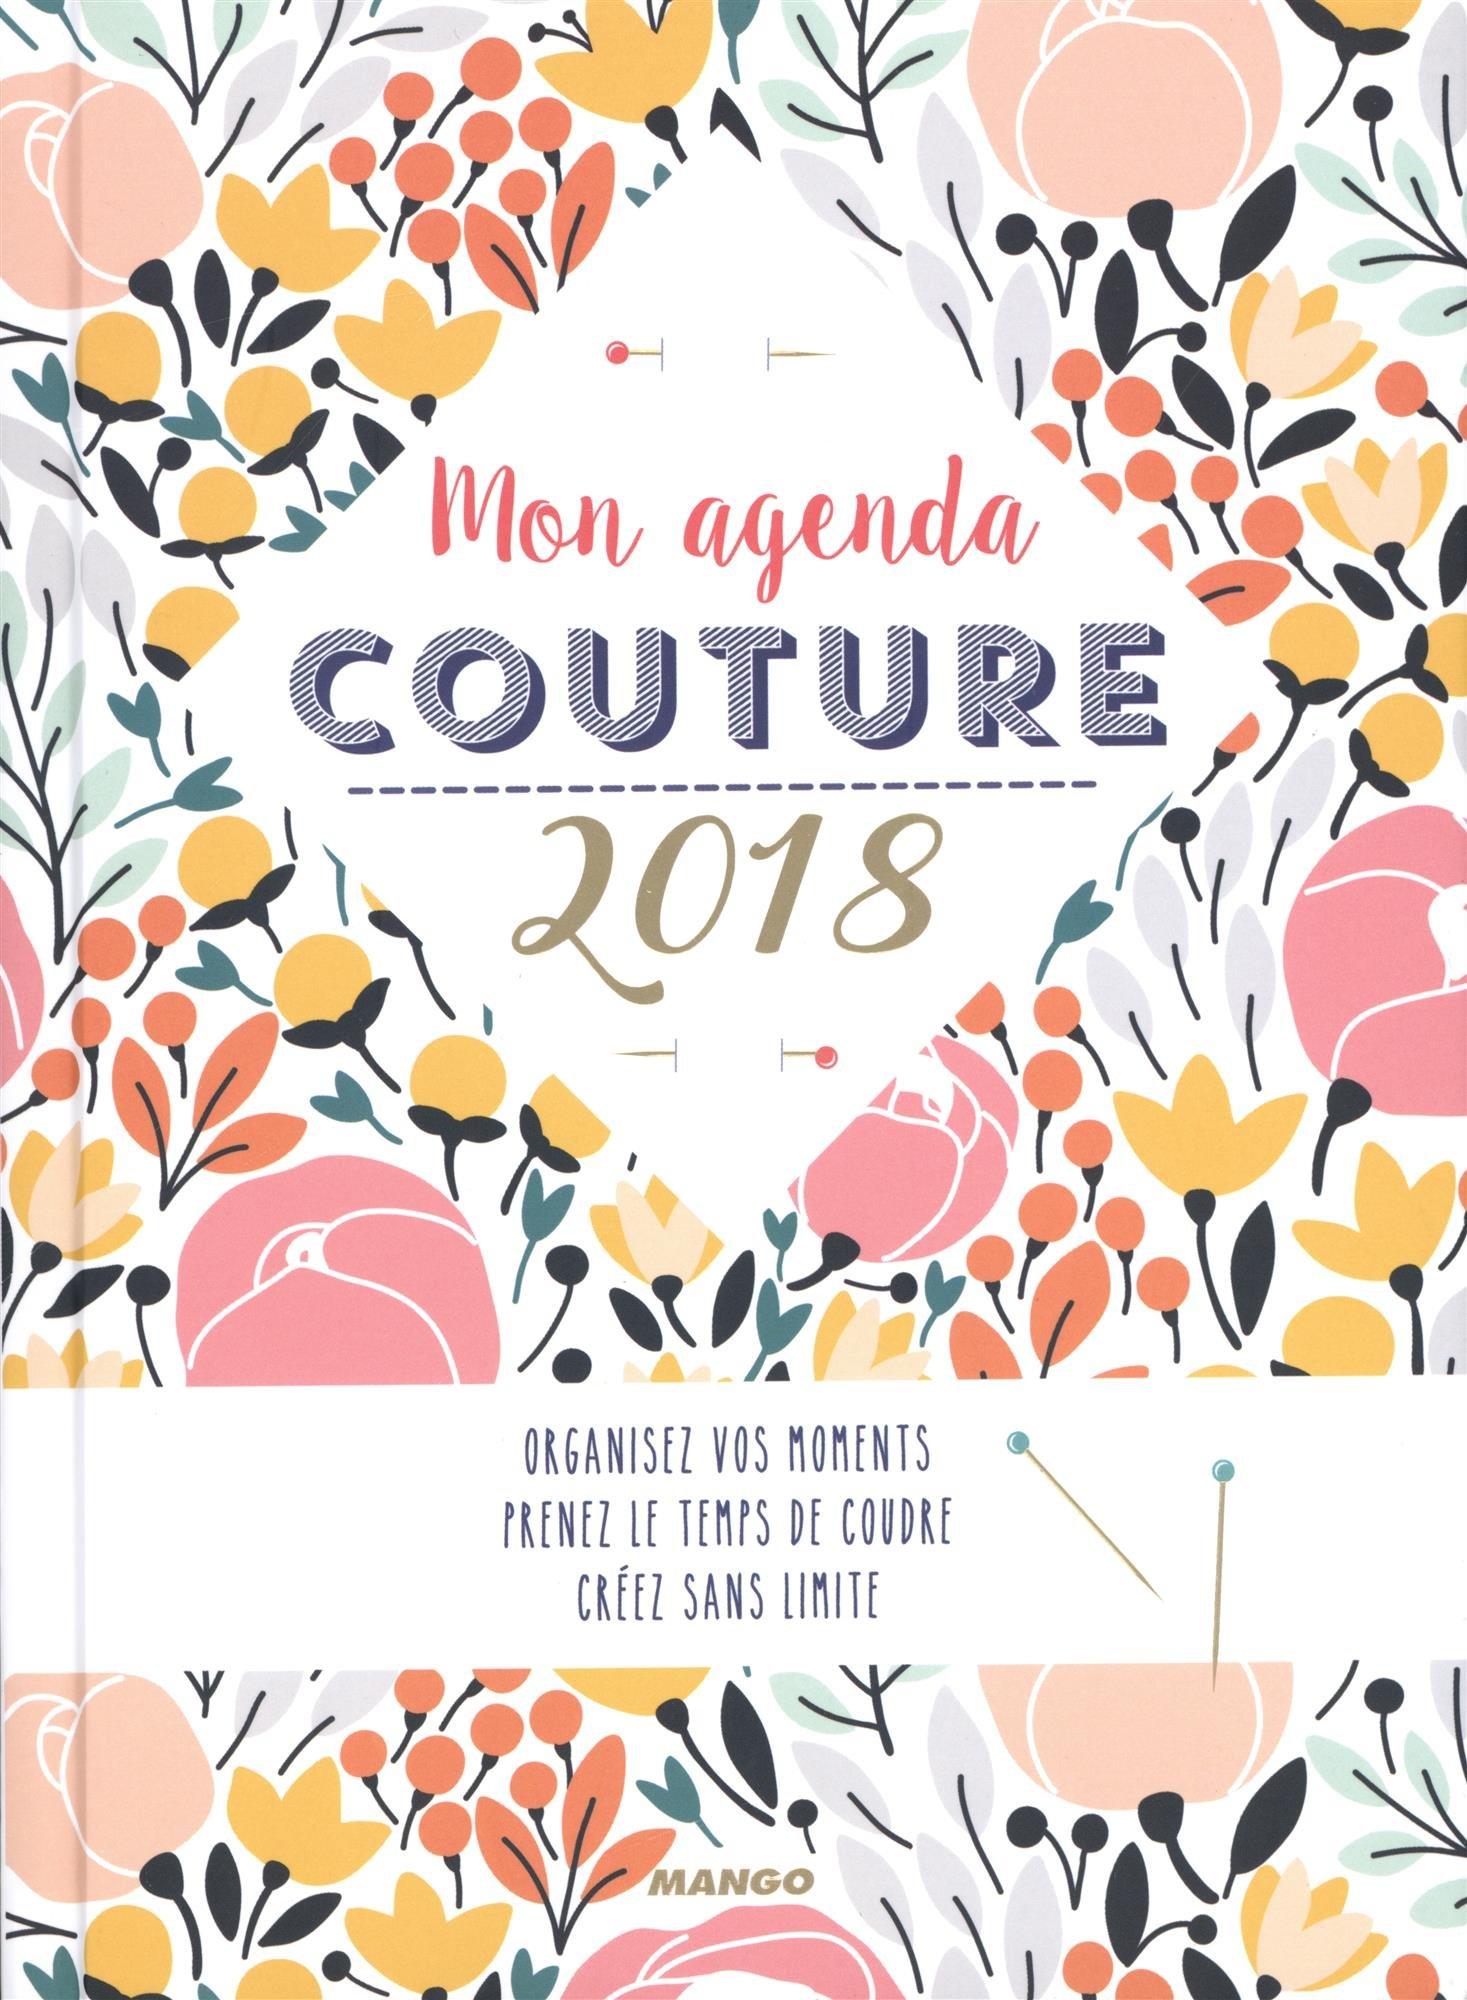 Agenda Couture Mon Agenda Couture 2018 Relié – 18 août 2017 Morieux/Collectif MANGO 2812504986 Agendas